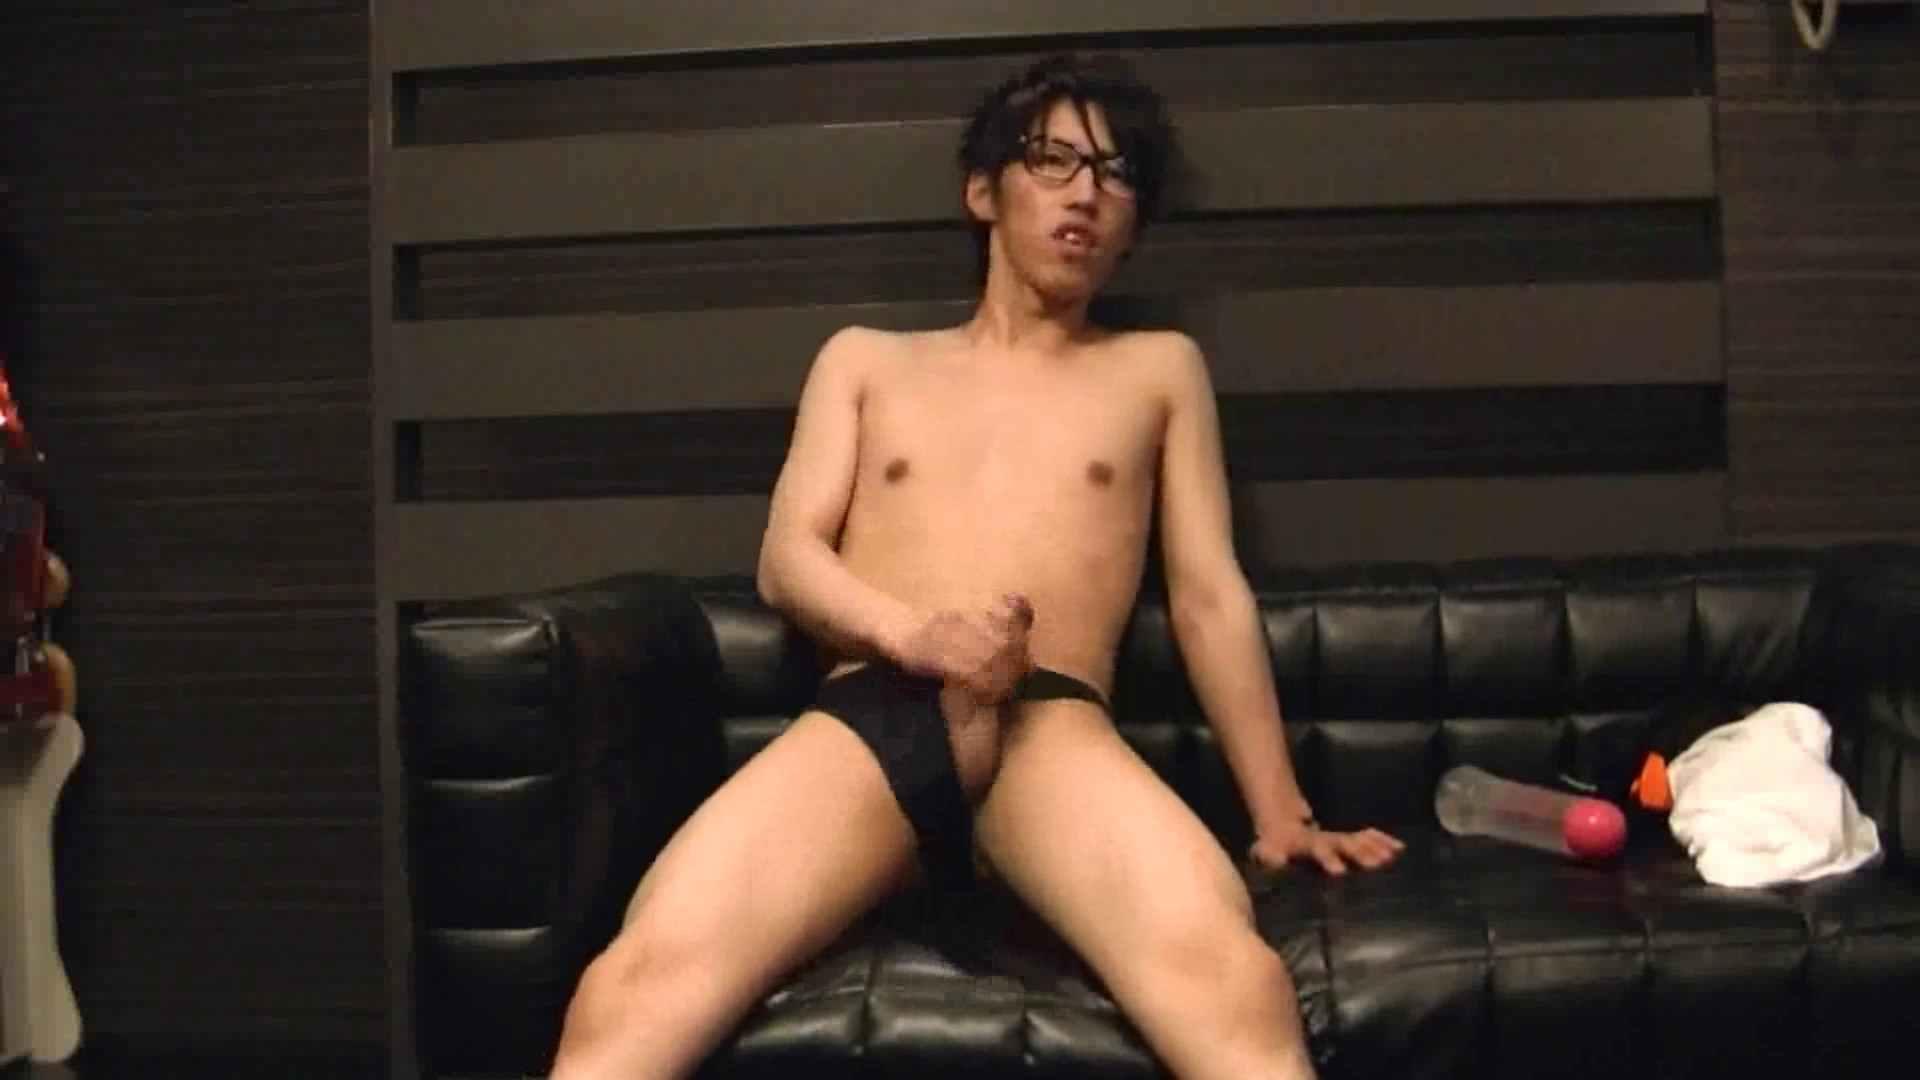 ONA見せカーニバル!! Vol3 男・男 ゲイ無料無修正画像 72pic 63